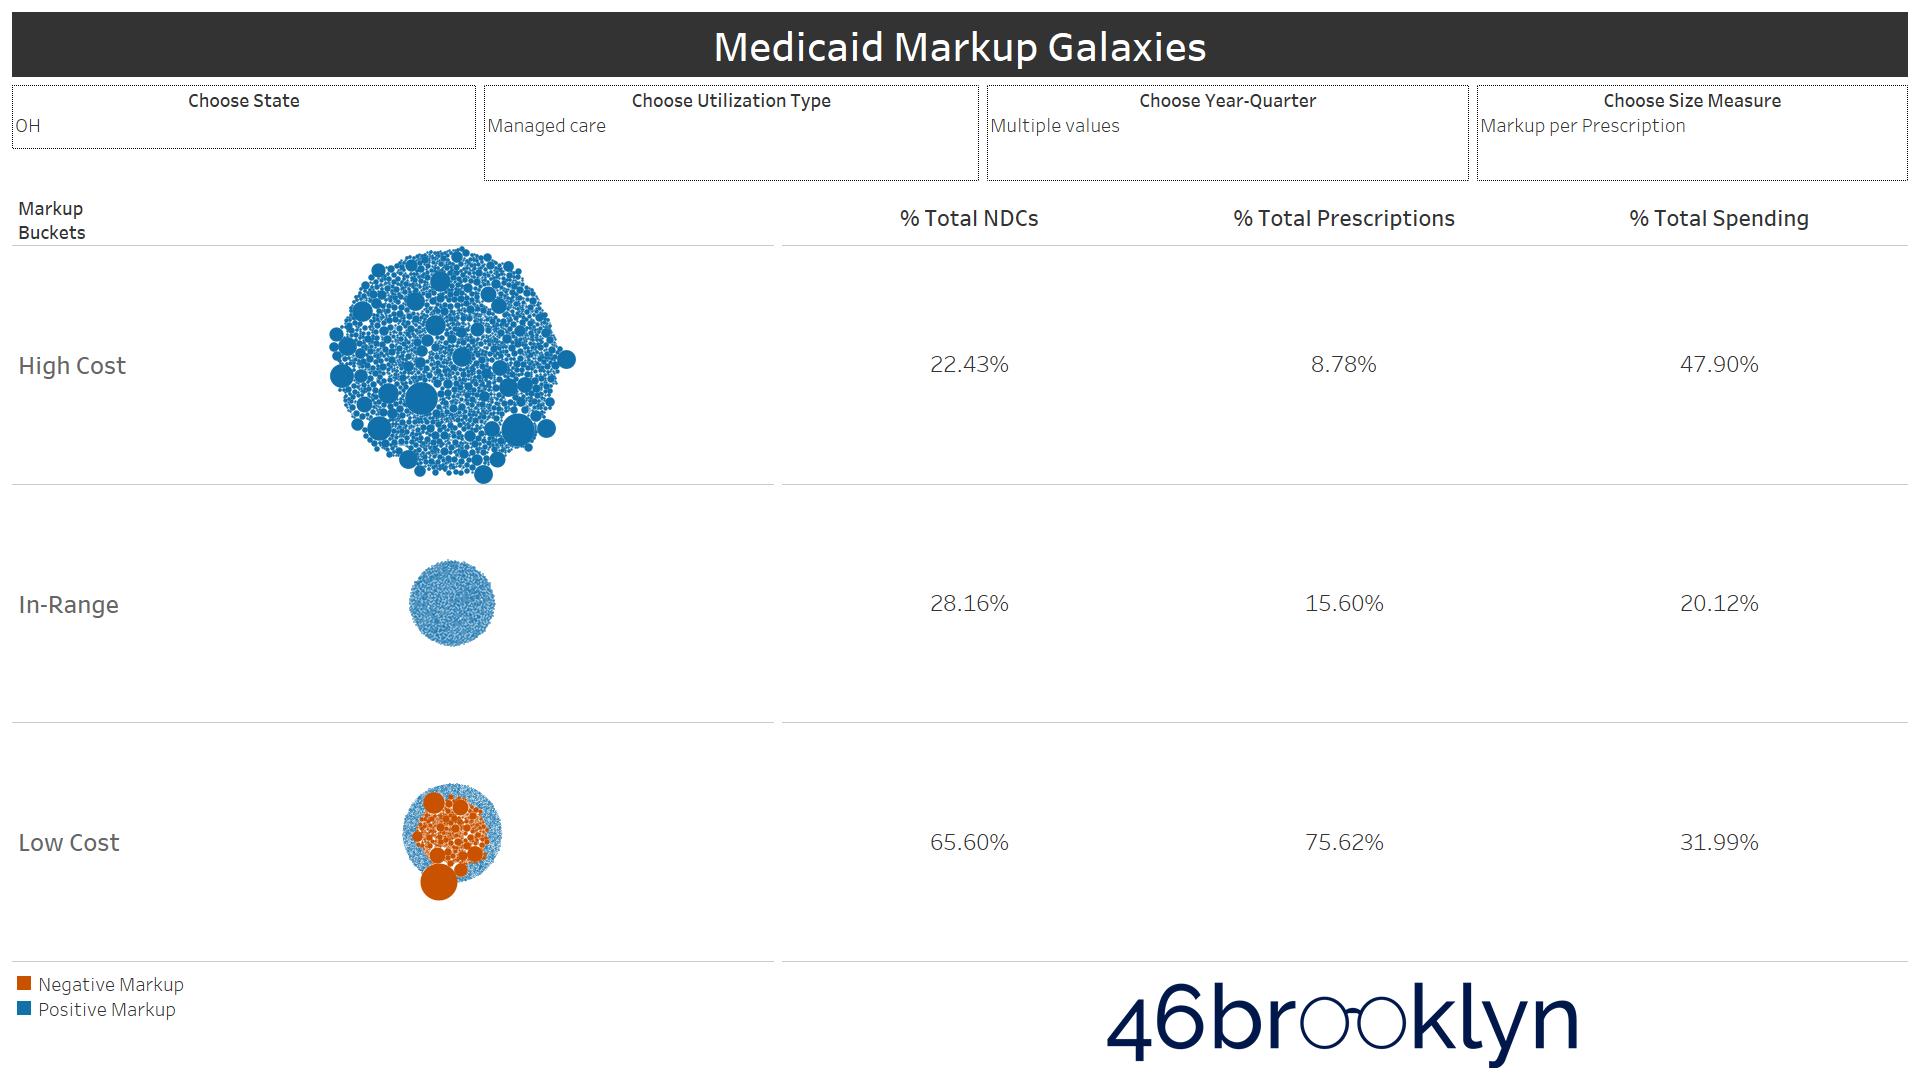 Figure 11   Source: Data.Medicaid.gov, 46brooklyn Research